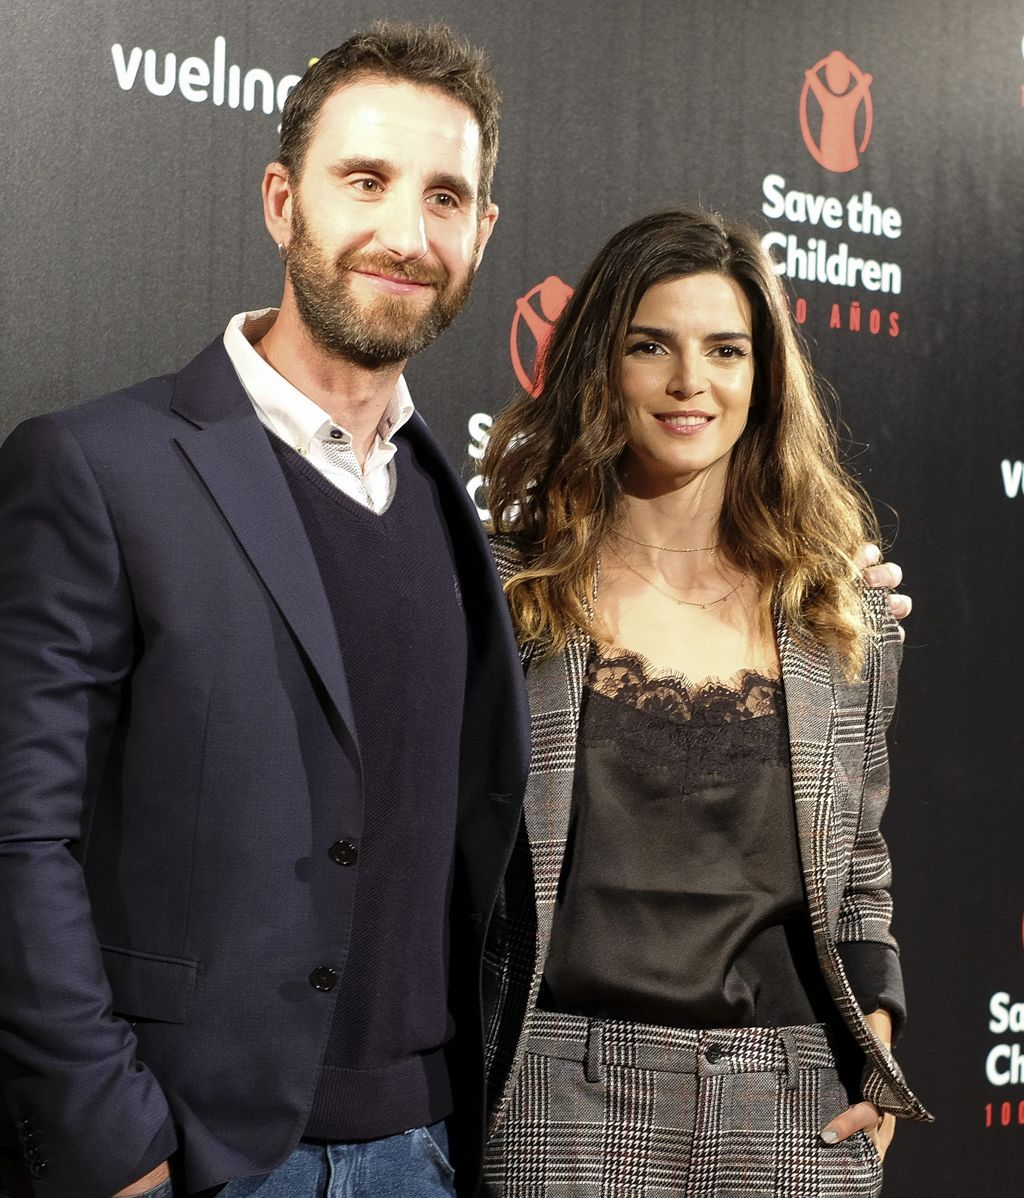 Dani Rovira y Clara Lago, en un evento para 'Save the Children'